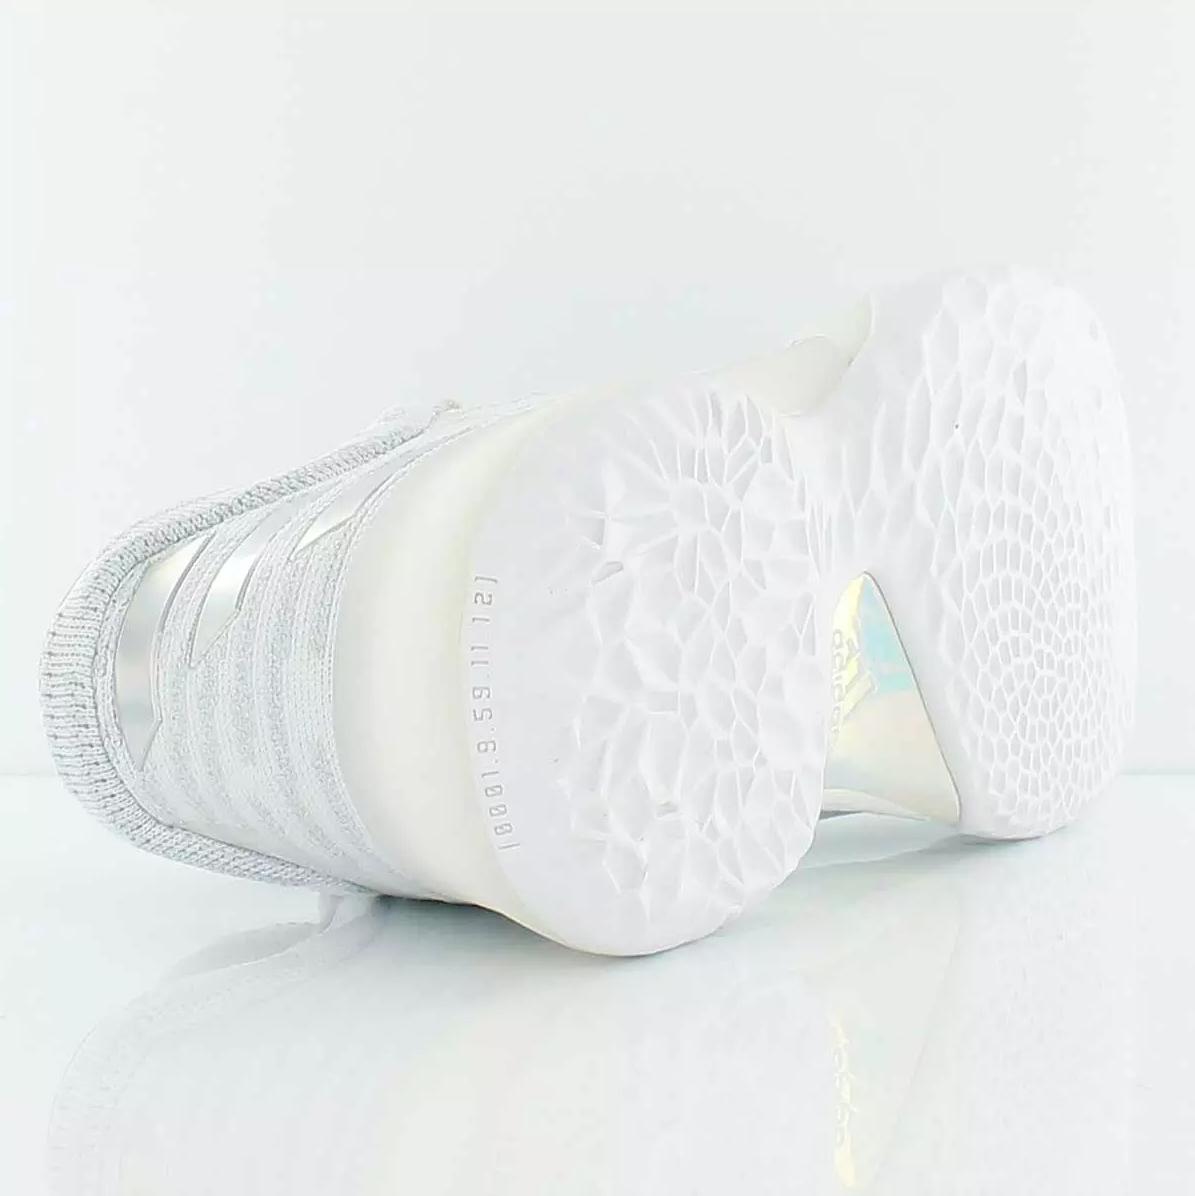 adidas harden vol. 1 primeknit all white 2